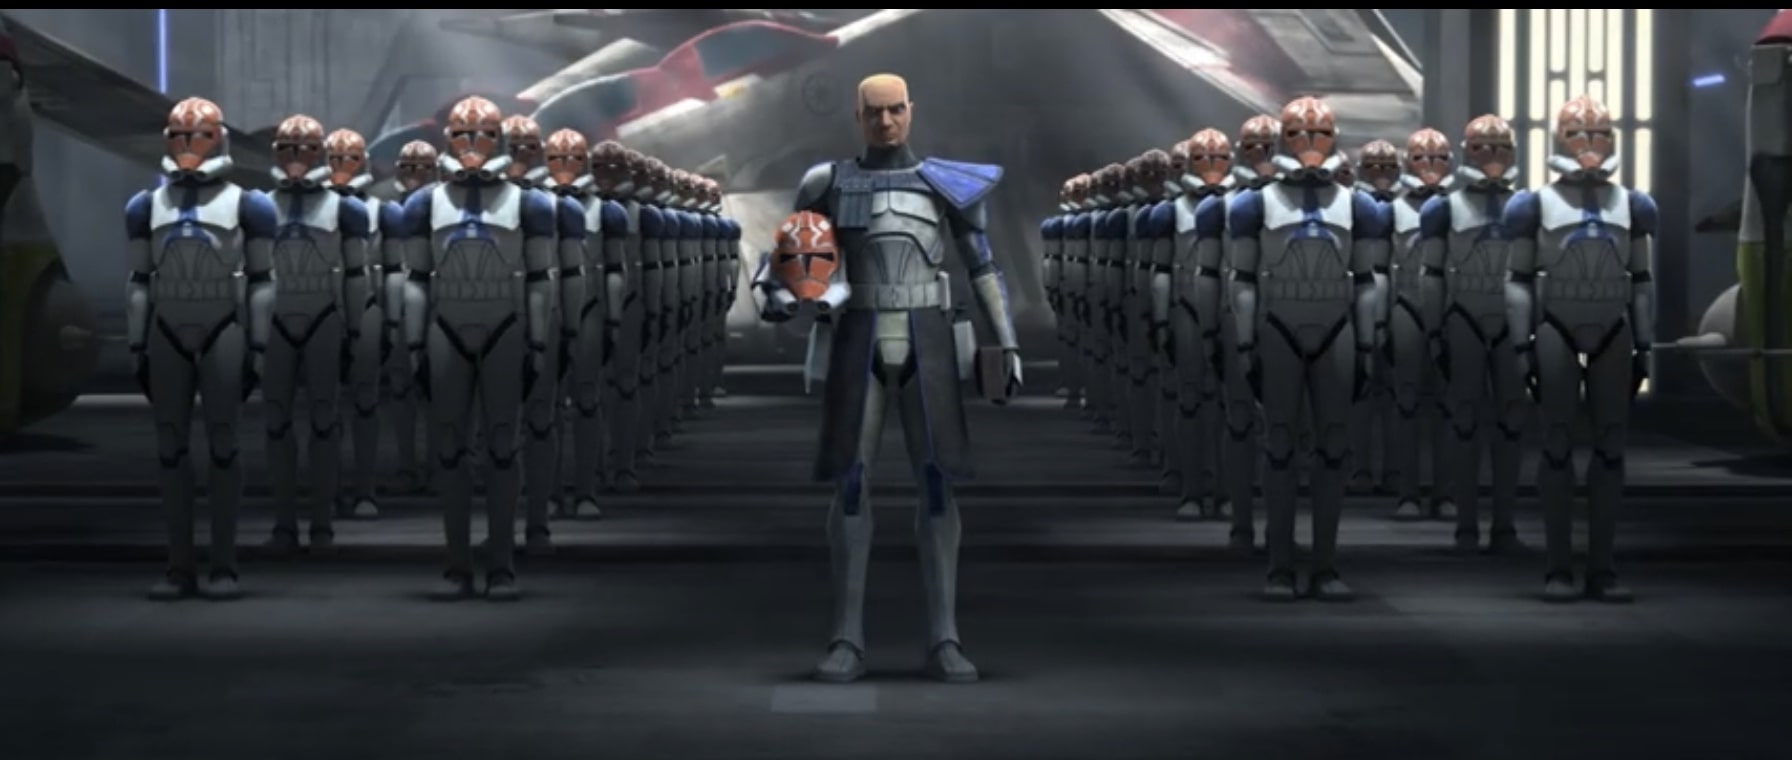 The 332nd Clone Legion